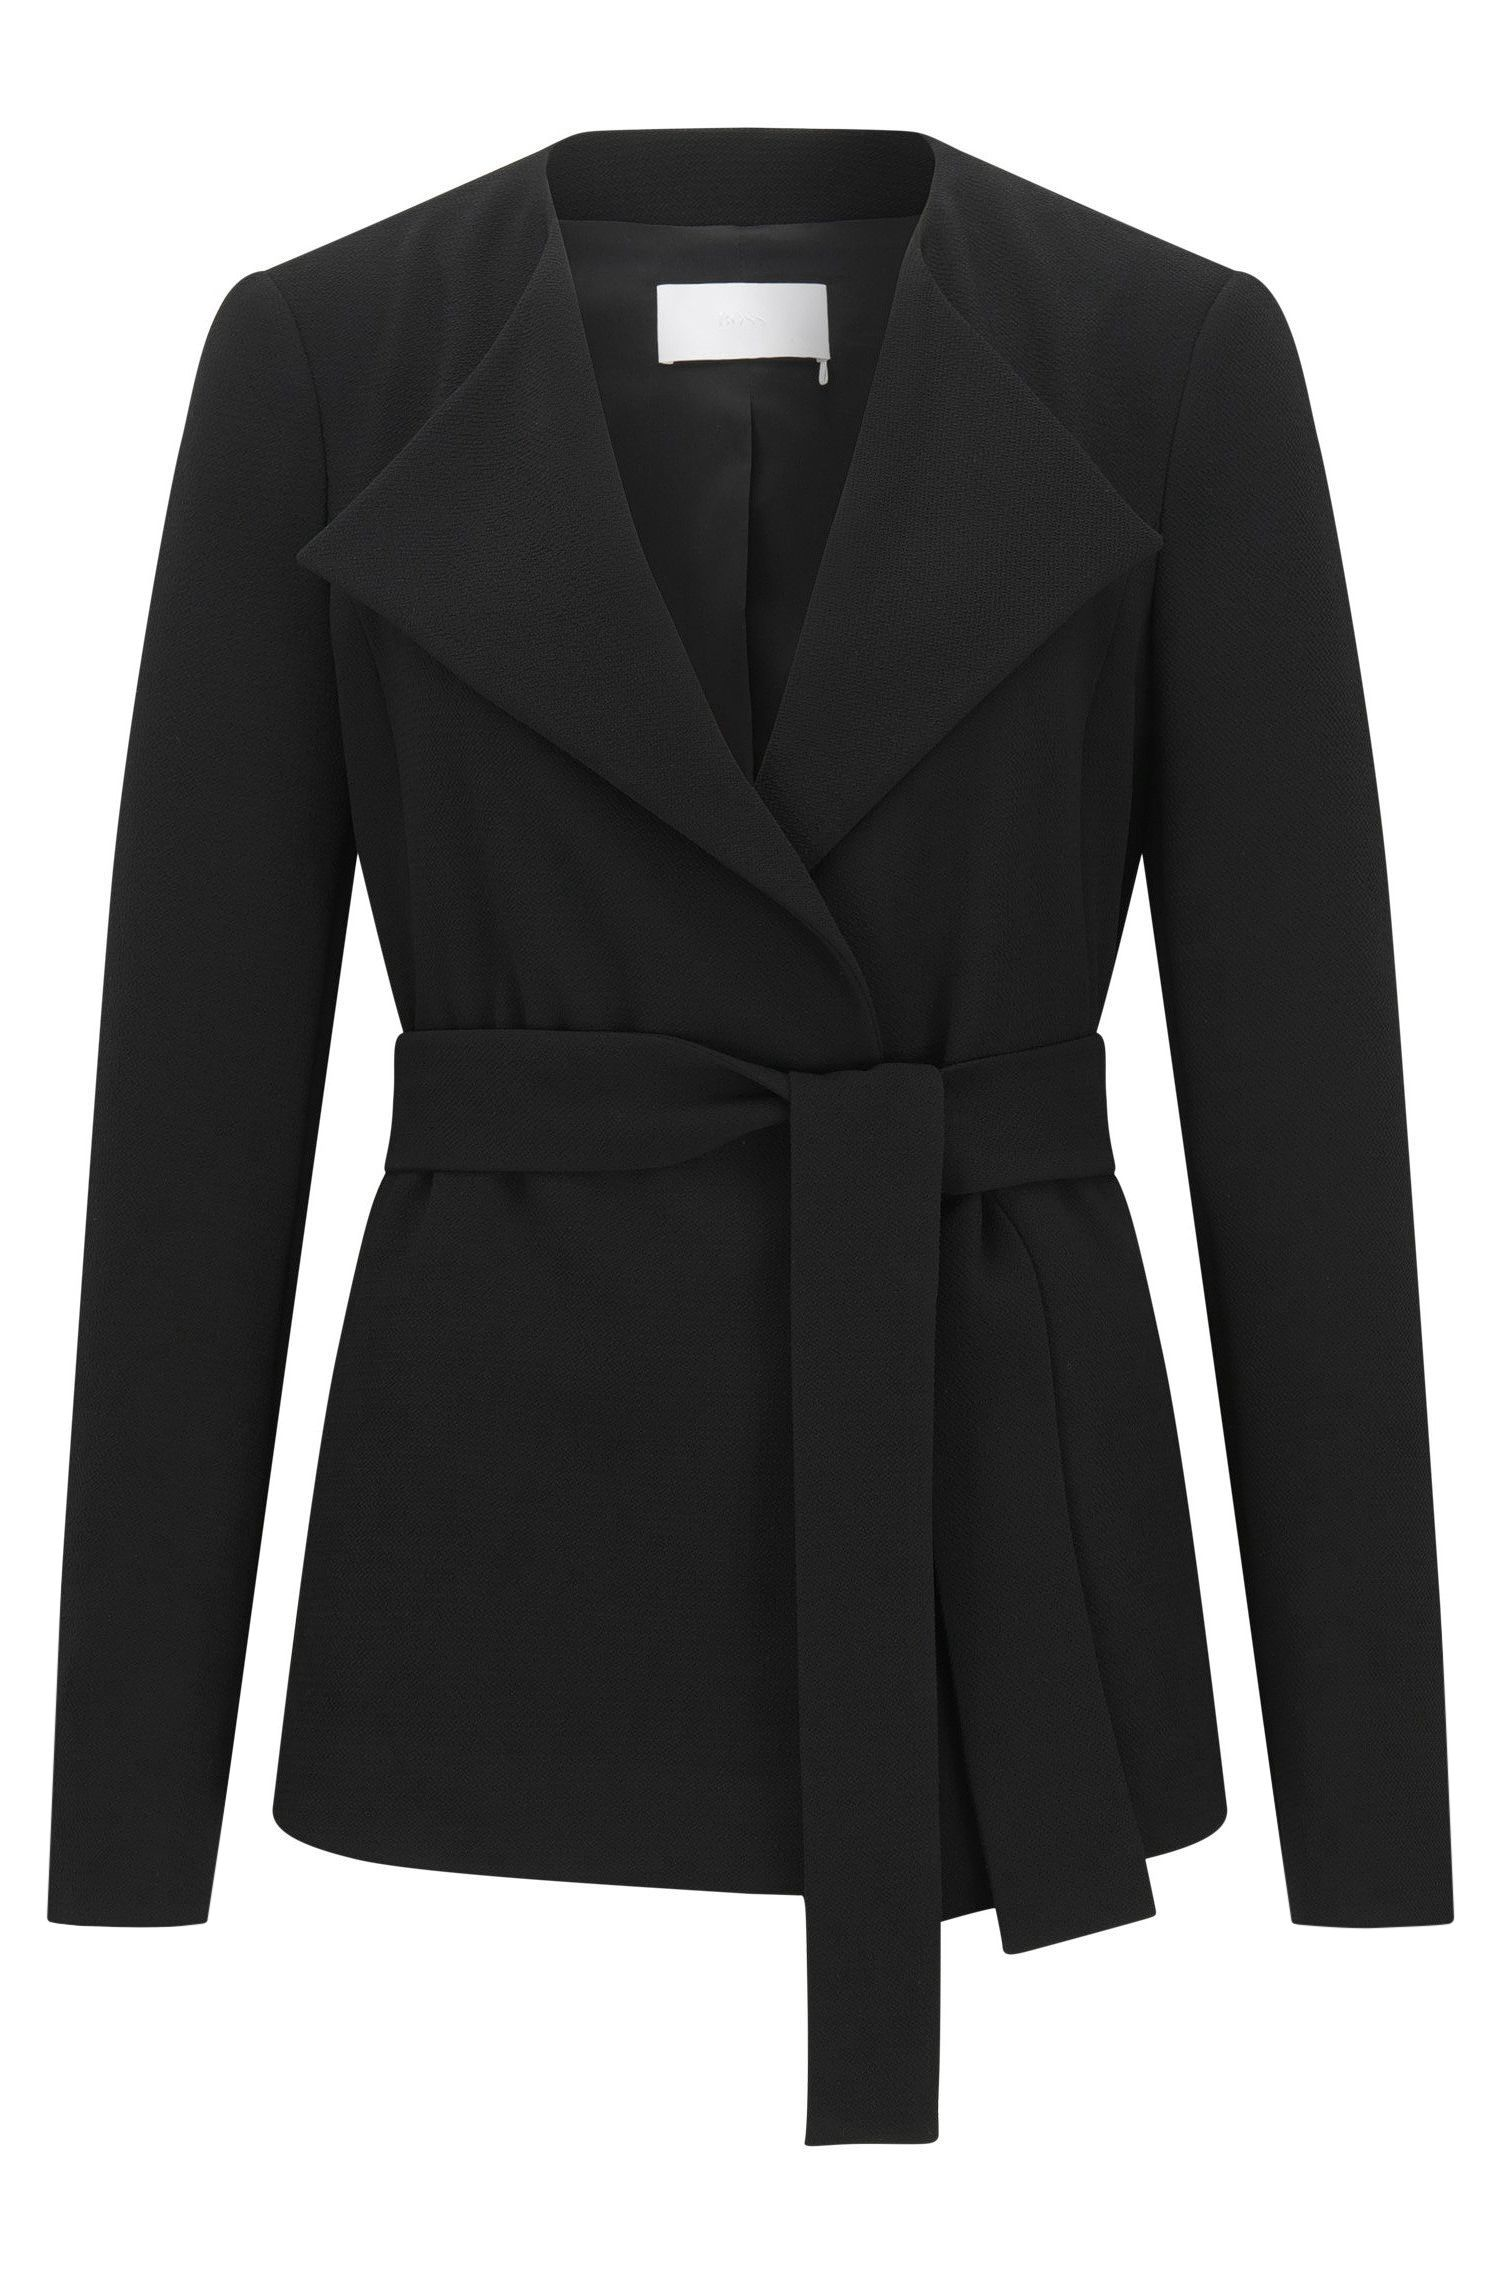 Self-Tie Woven Jacket | Karelina